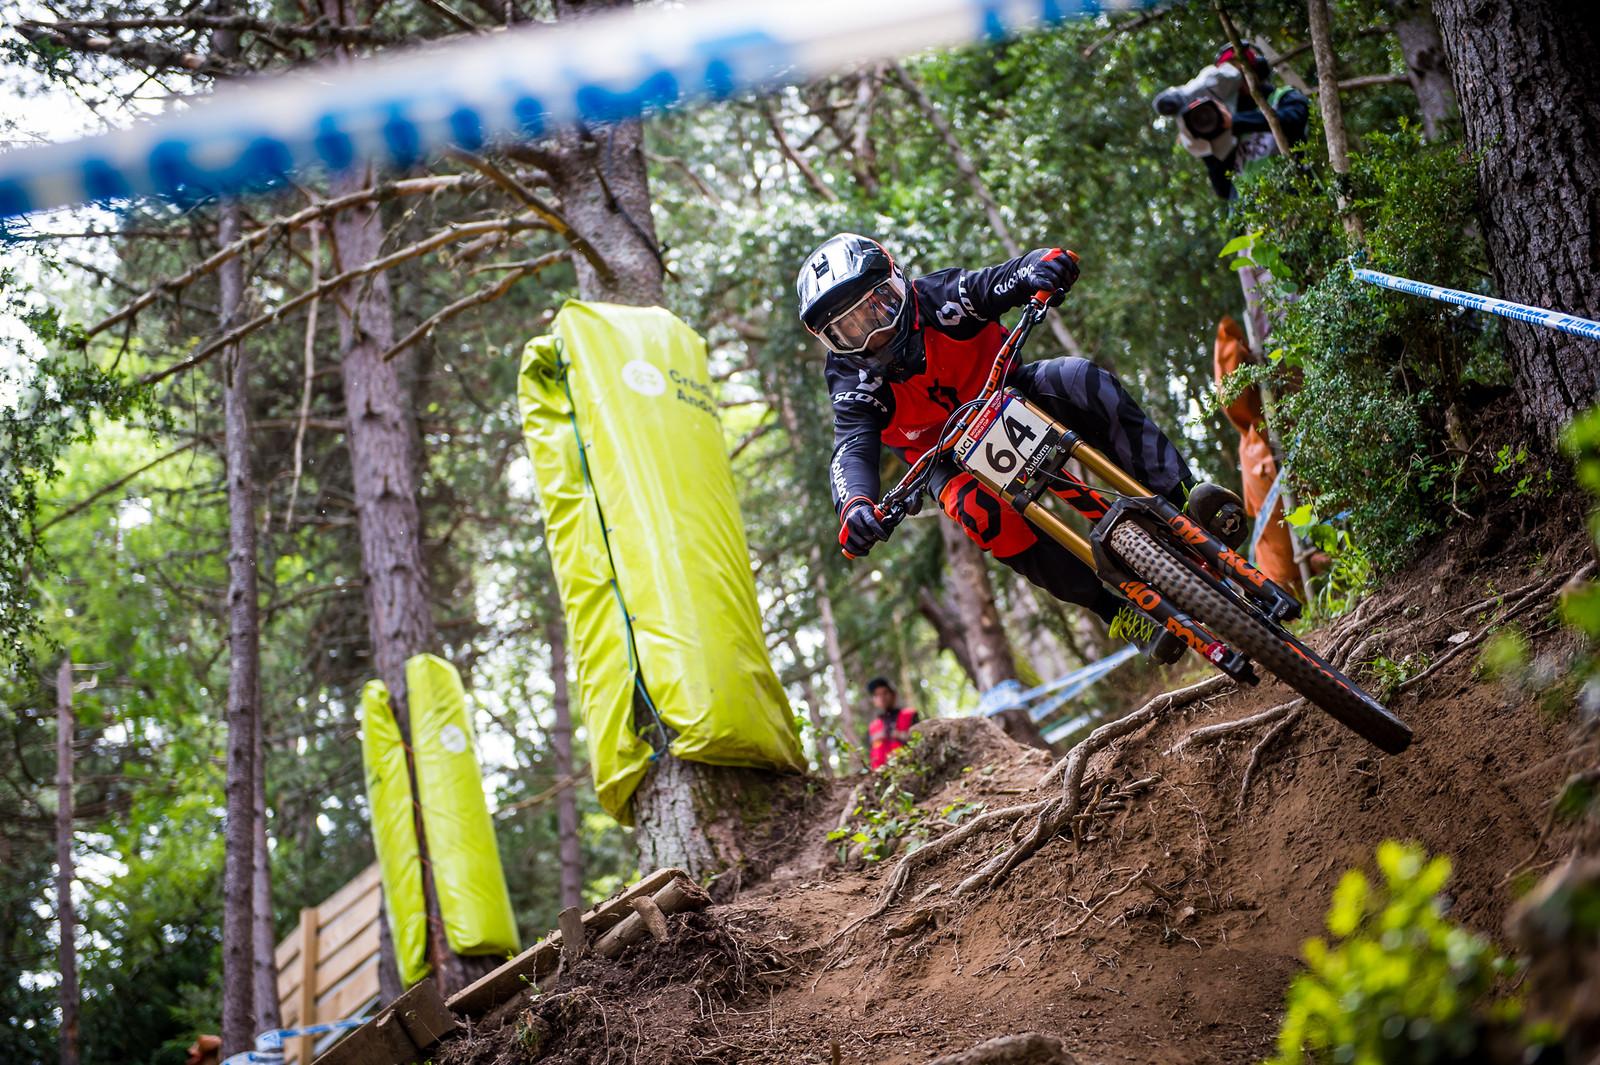 Gaetan Vige Finals - iceman2058 - Mountain Biking Pictures - Vital MTB